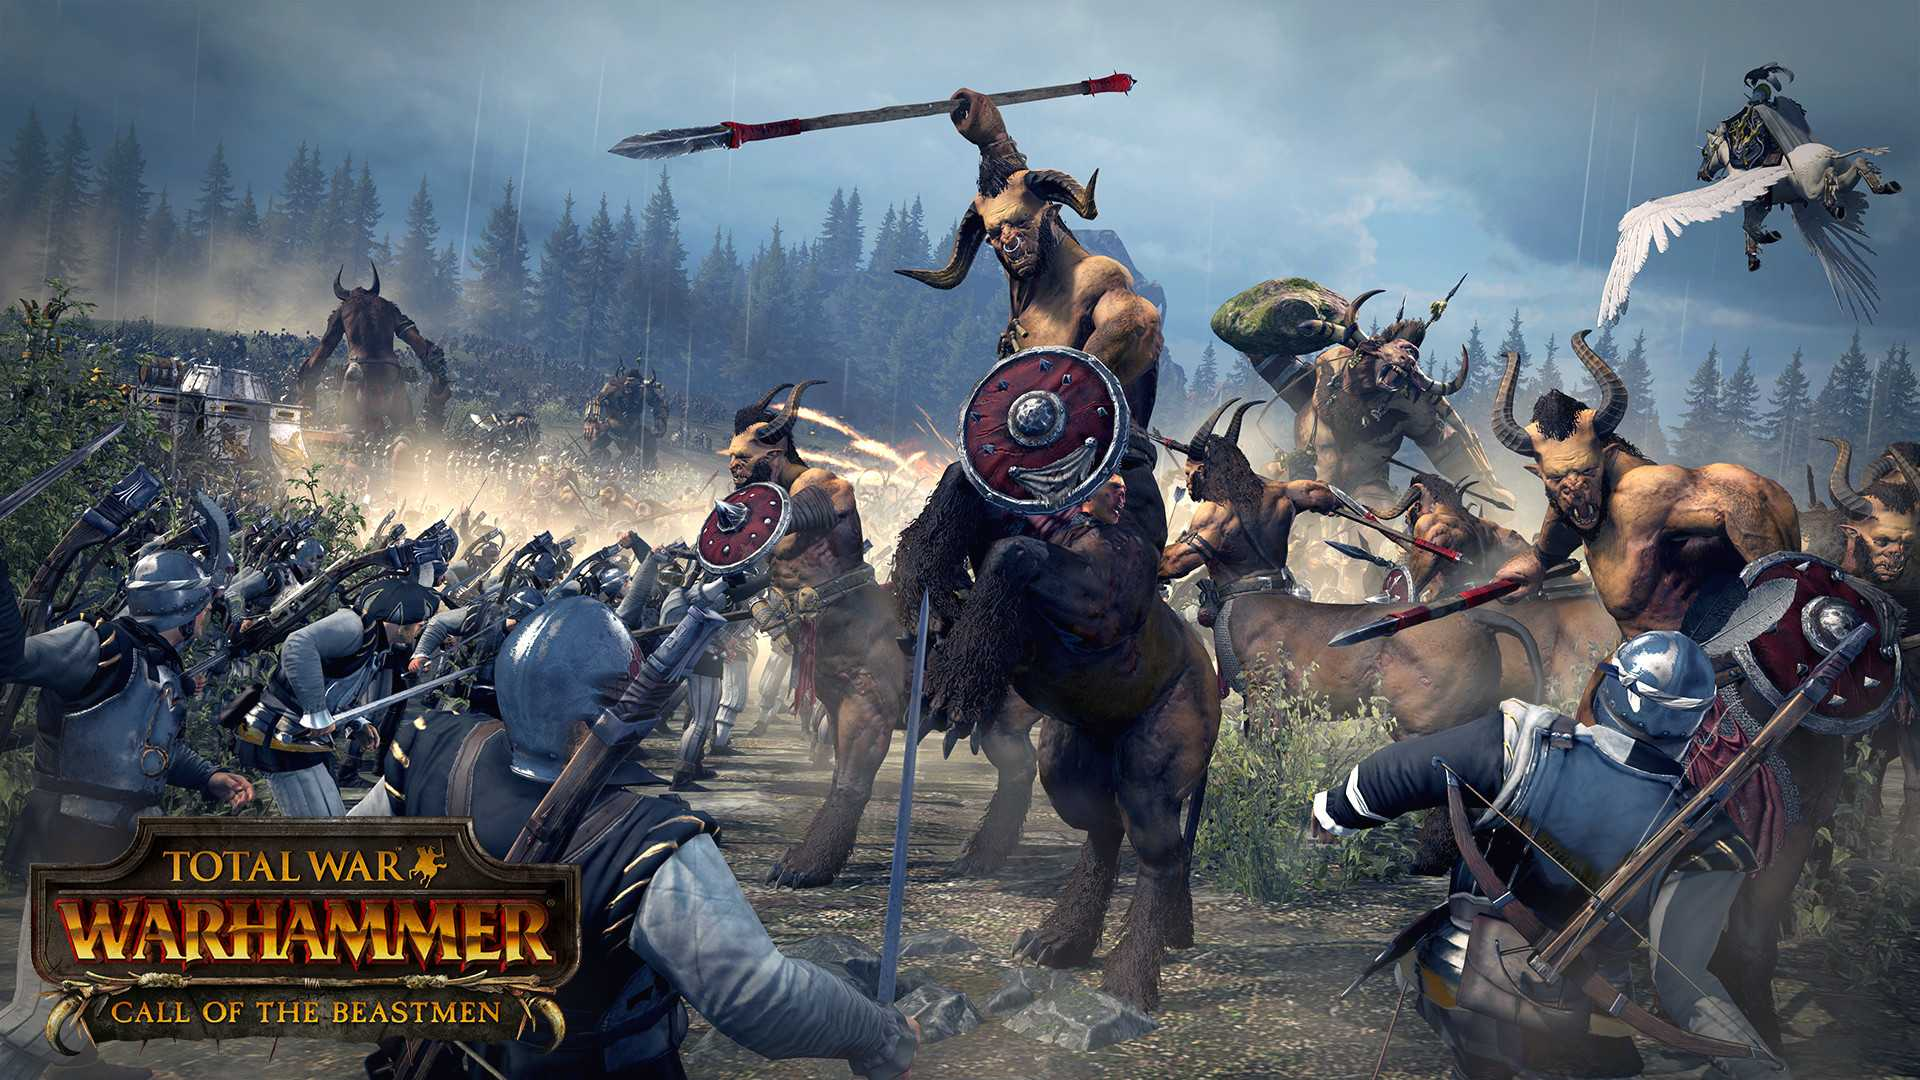 Скидки в Total War: WARHAMMER - Call of the Beastmen